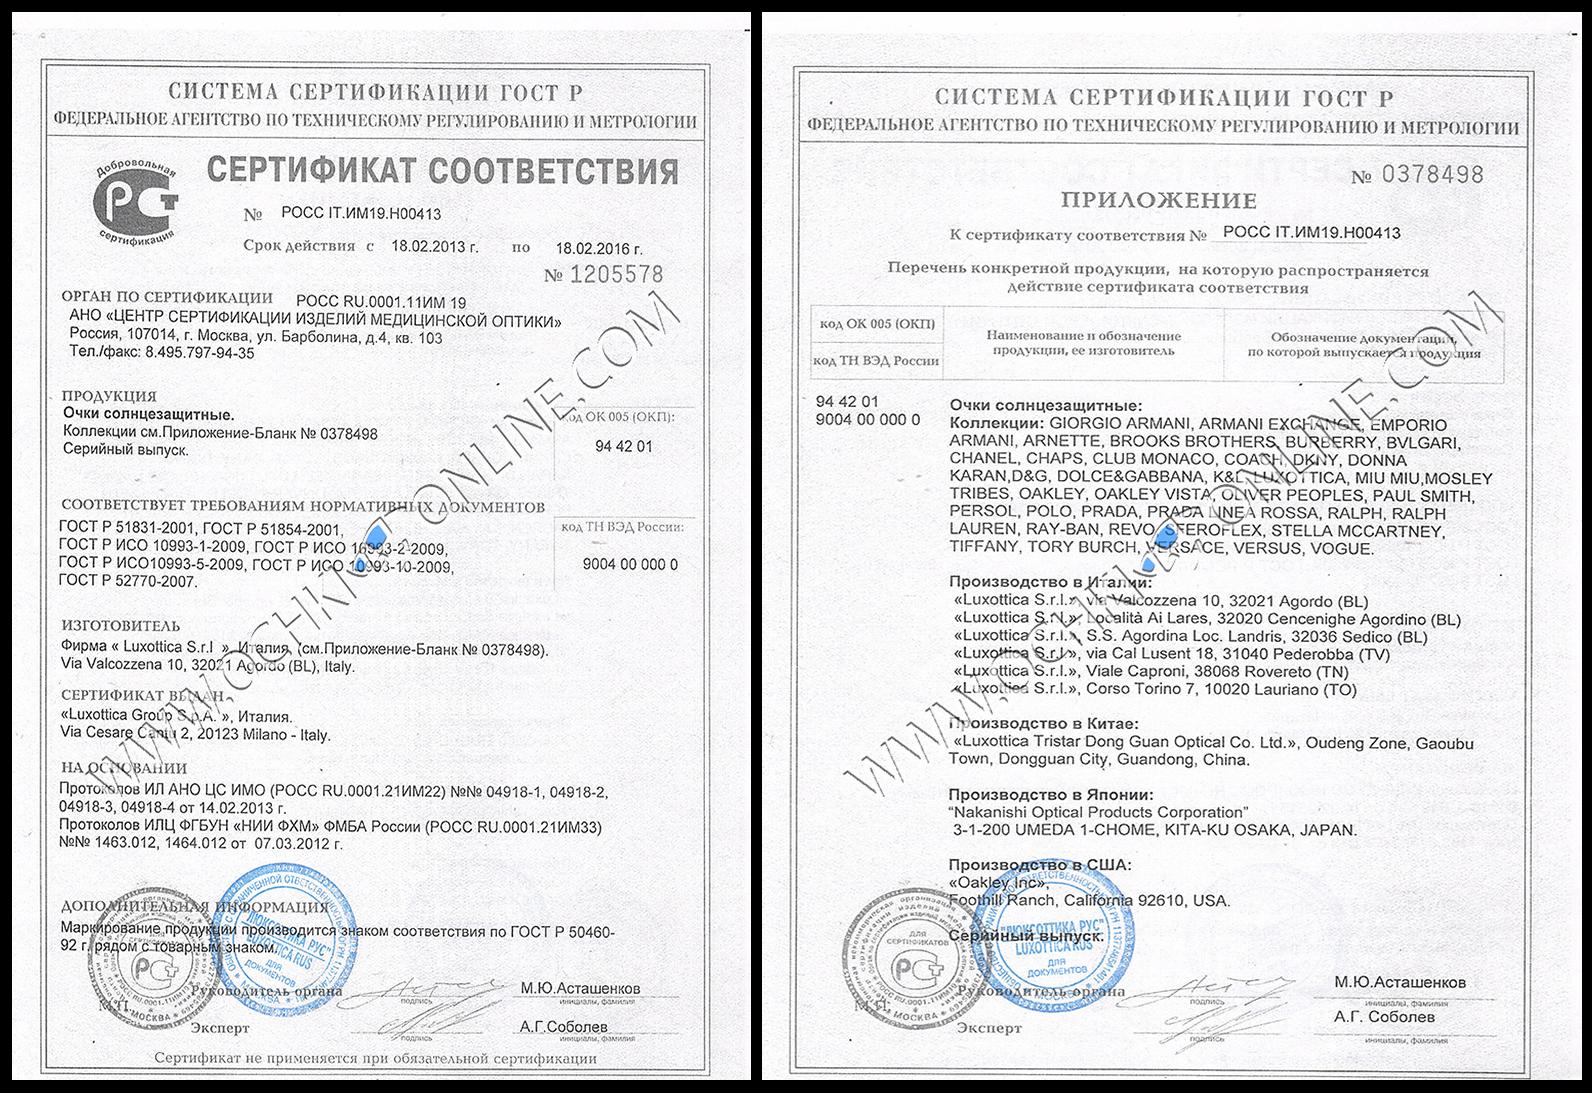 Сертификаты соответствия Luxottica Group S.p.A.